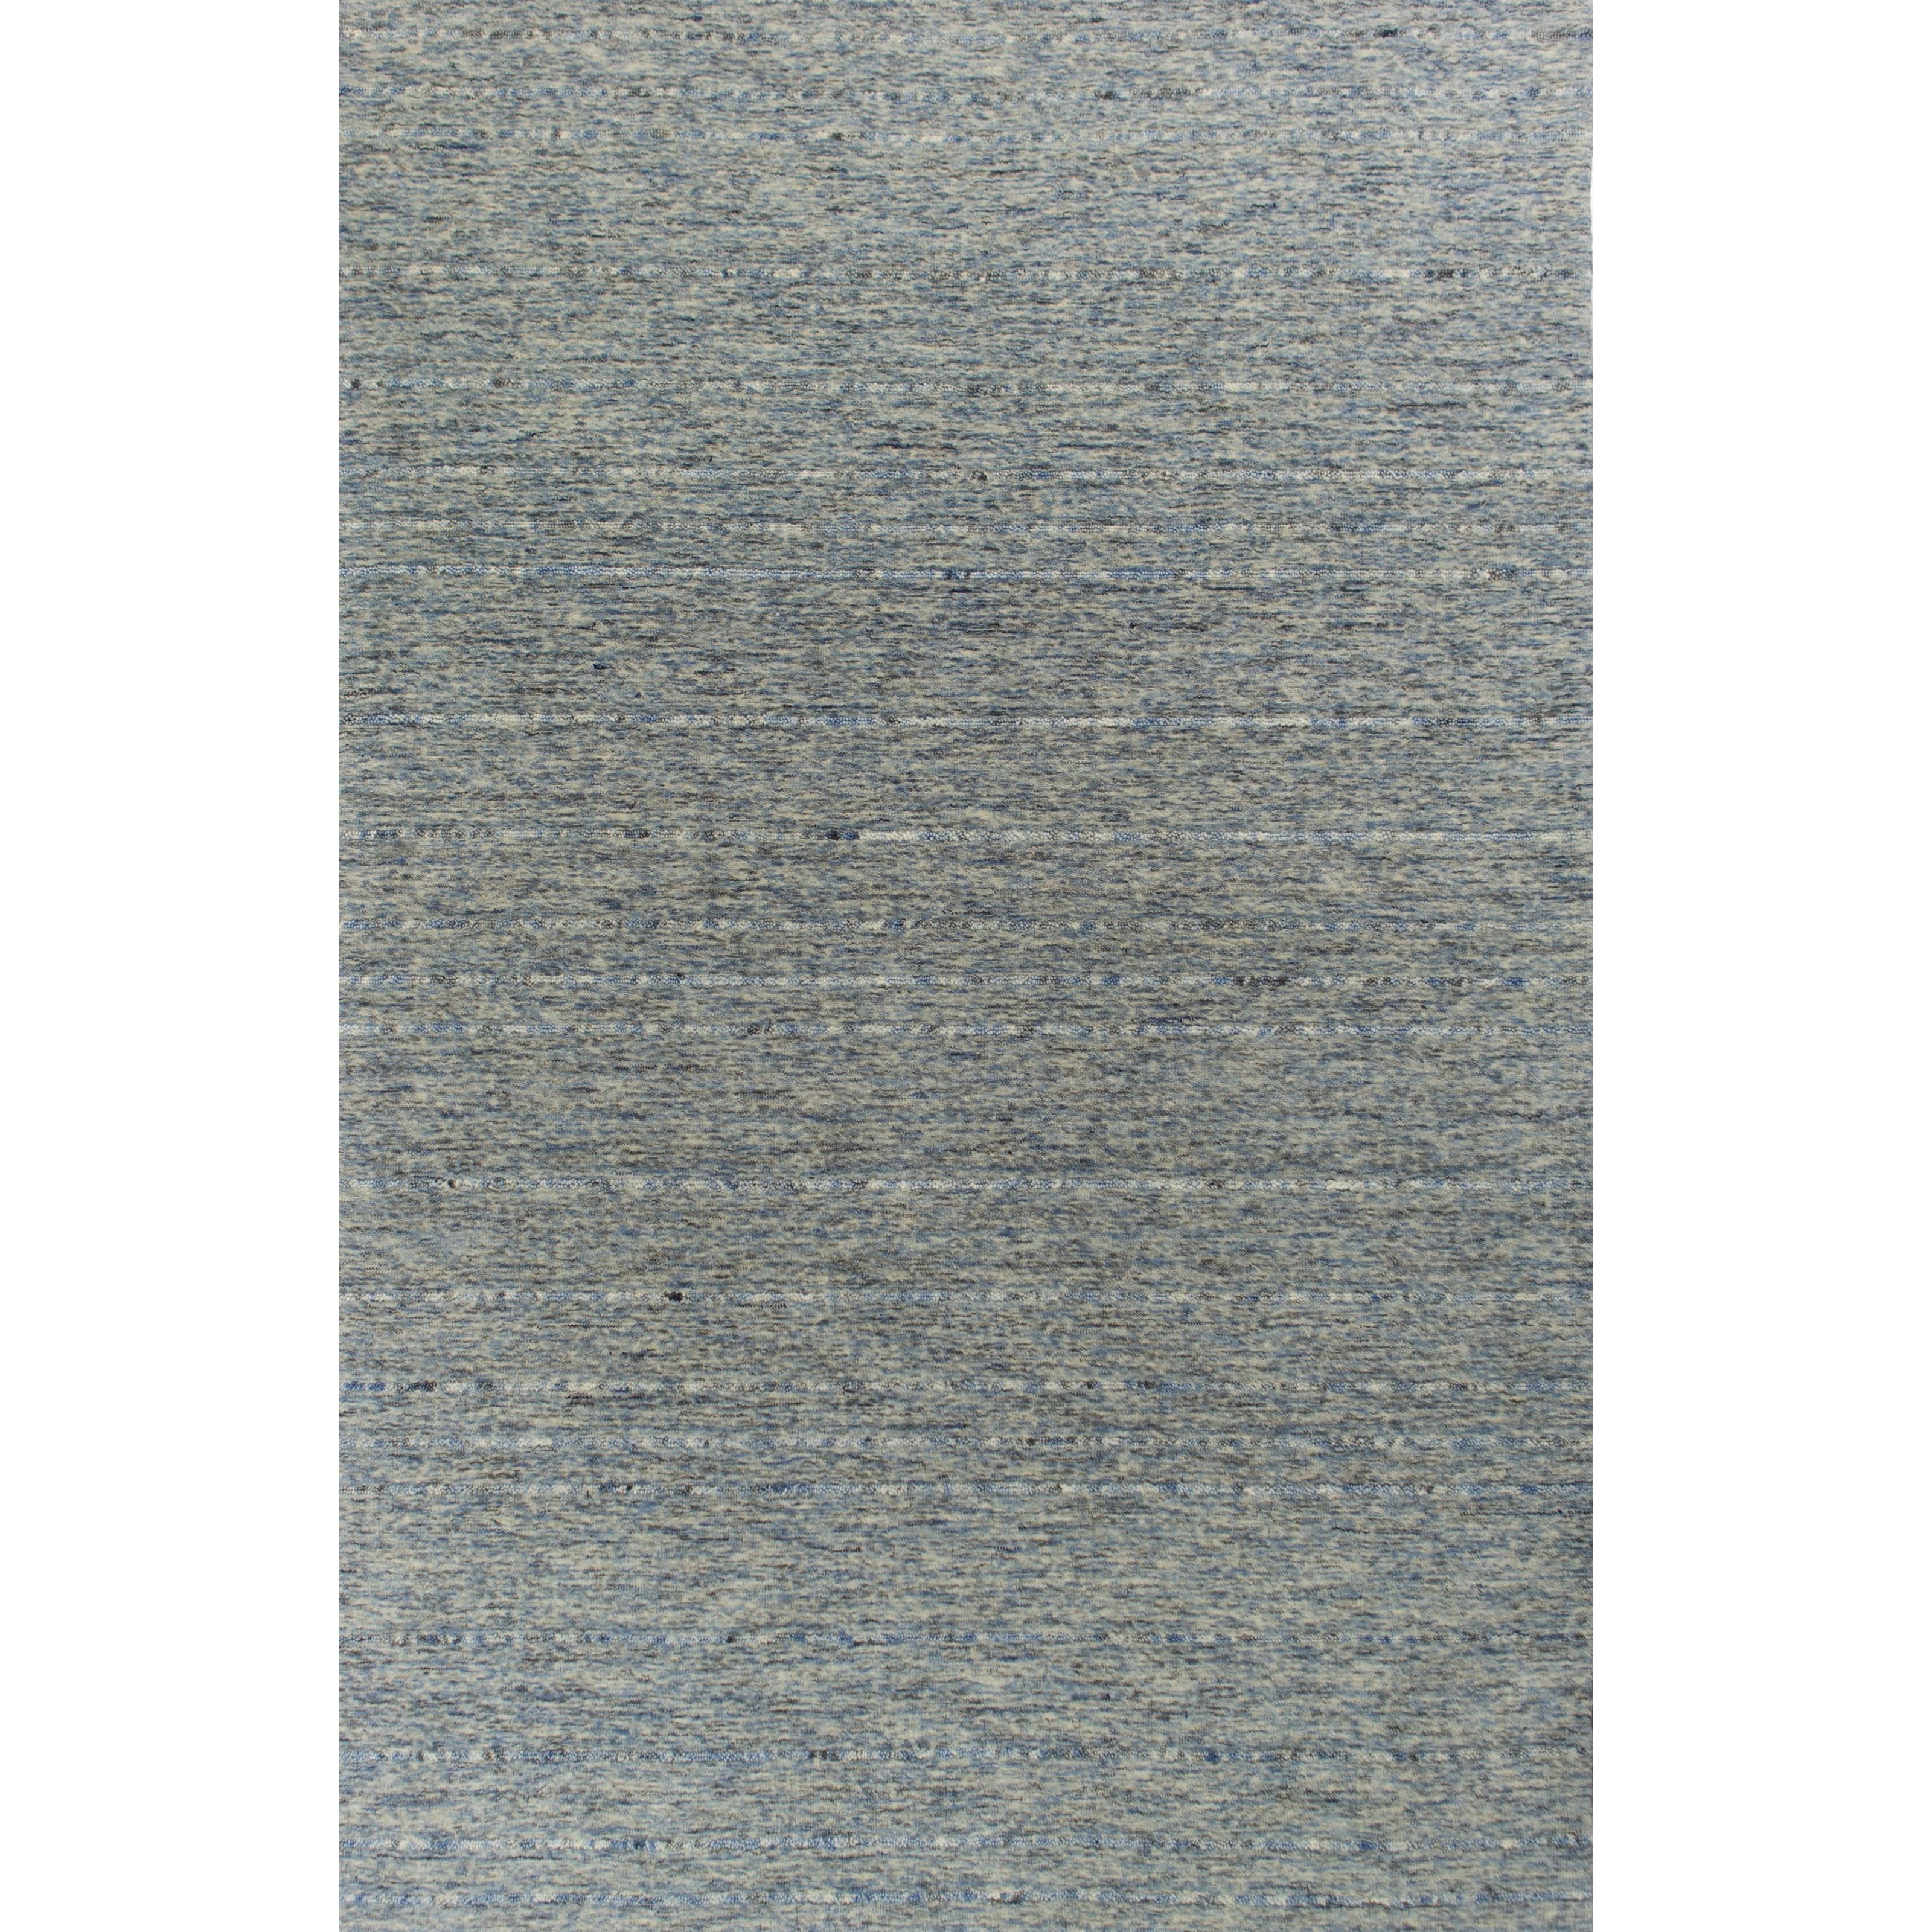 Parker 5' x 7' Denim Elements Rug by Kas at Wilson's Furniture